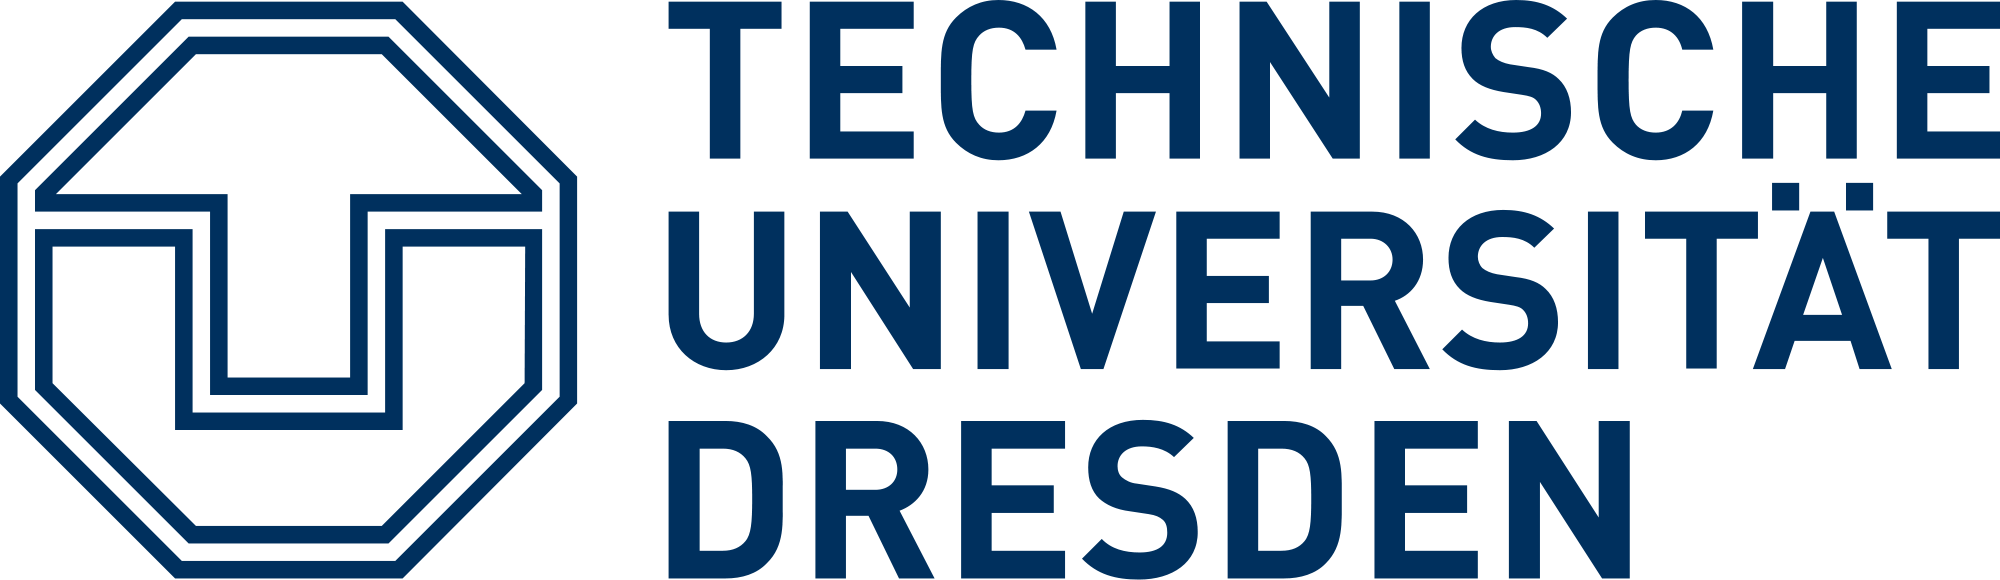 Vorbereitungssemester | Technische Universität Dresden